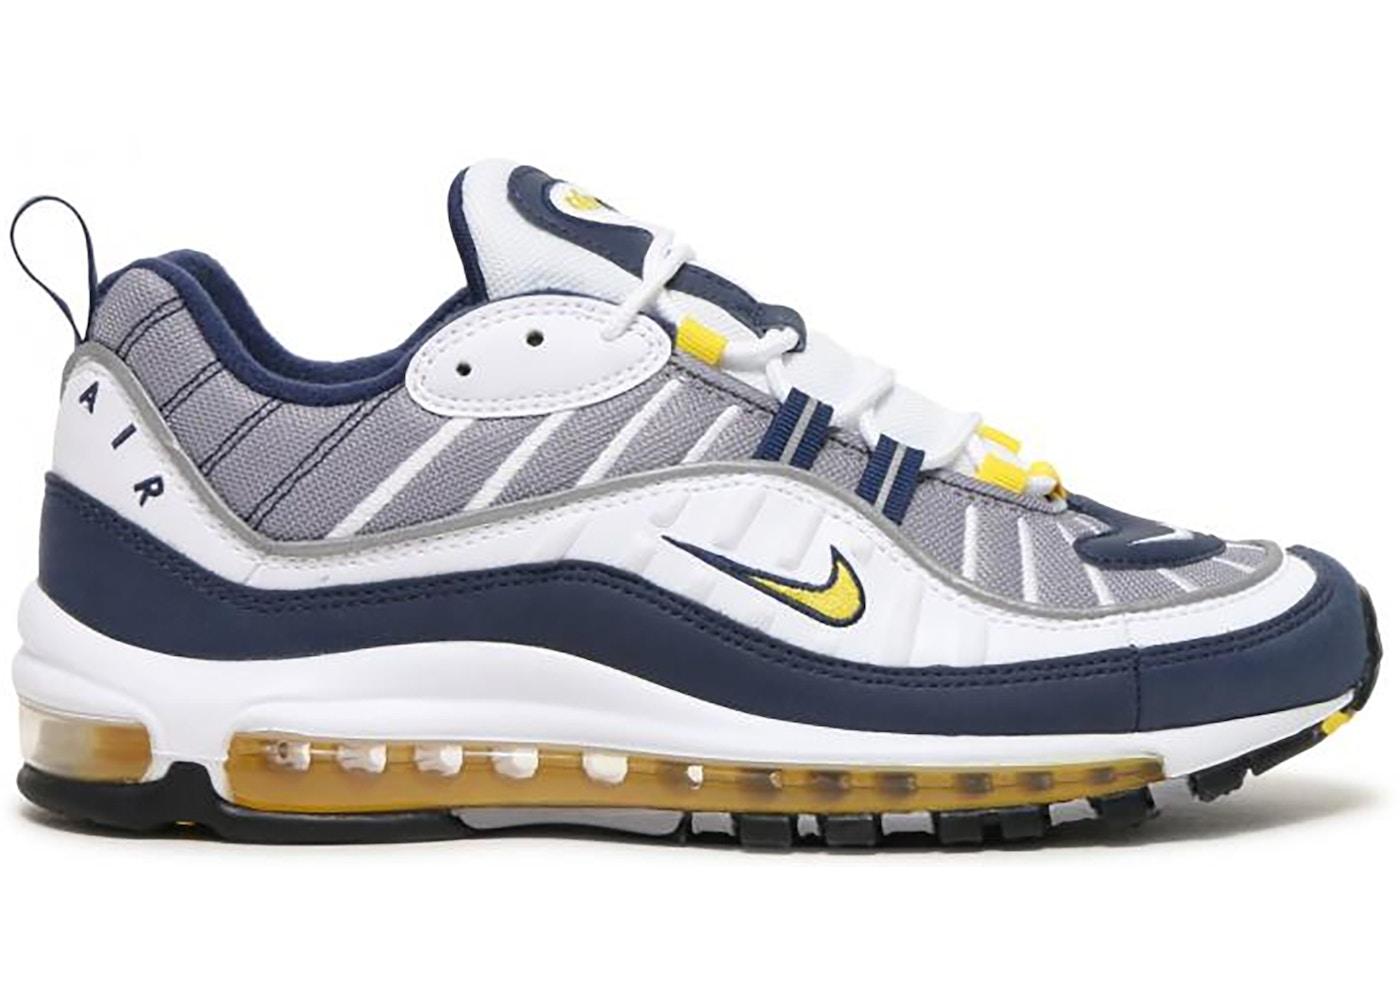 Nike Air Max 98 Tour Yellow Grey